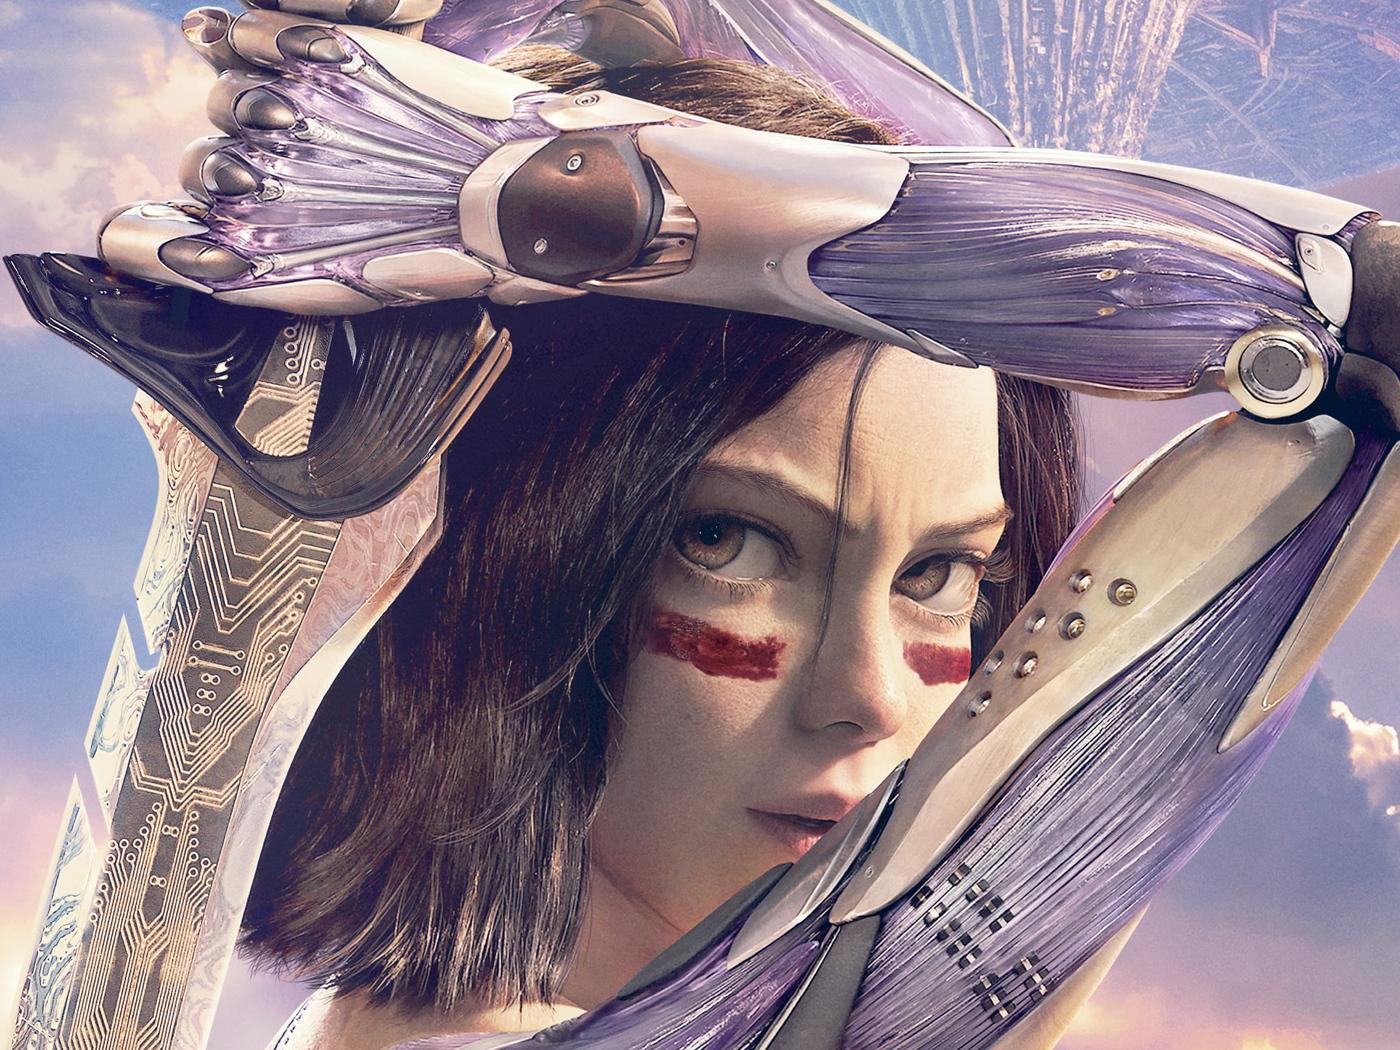 the-alita-battle-angel-2020-oj.jpg